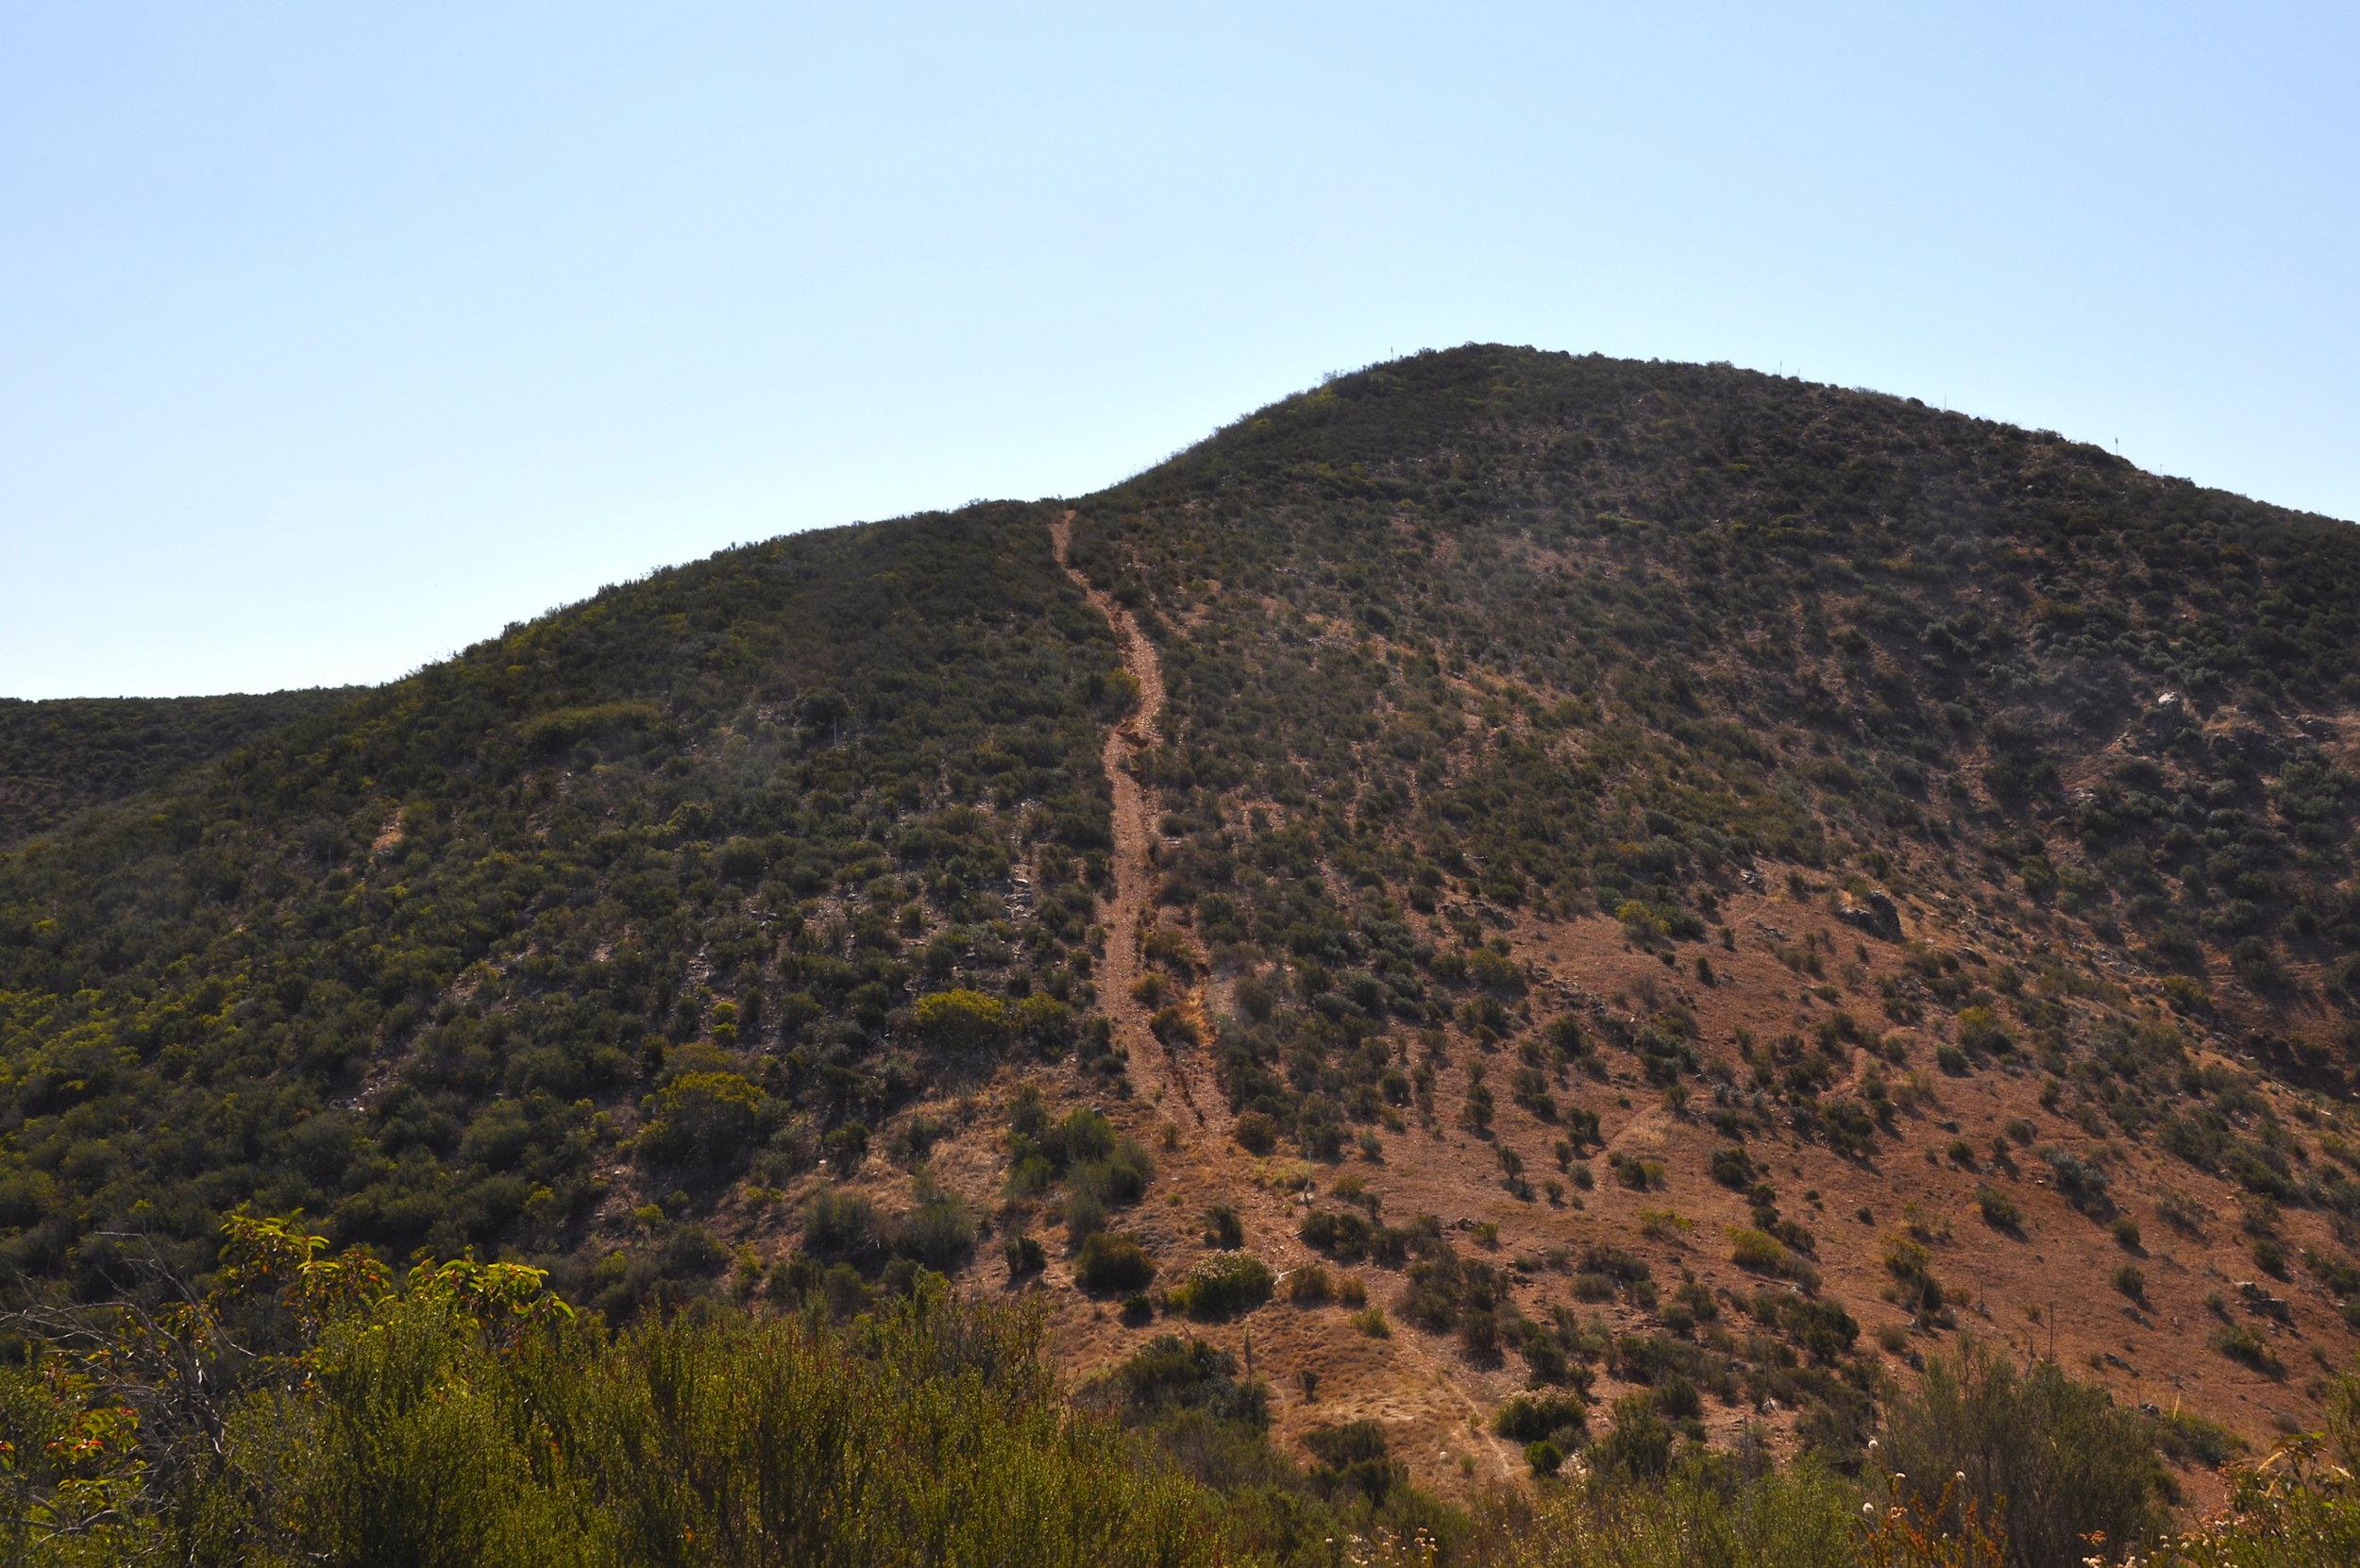 Jamul Mountain